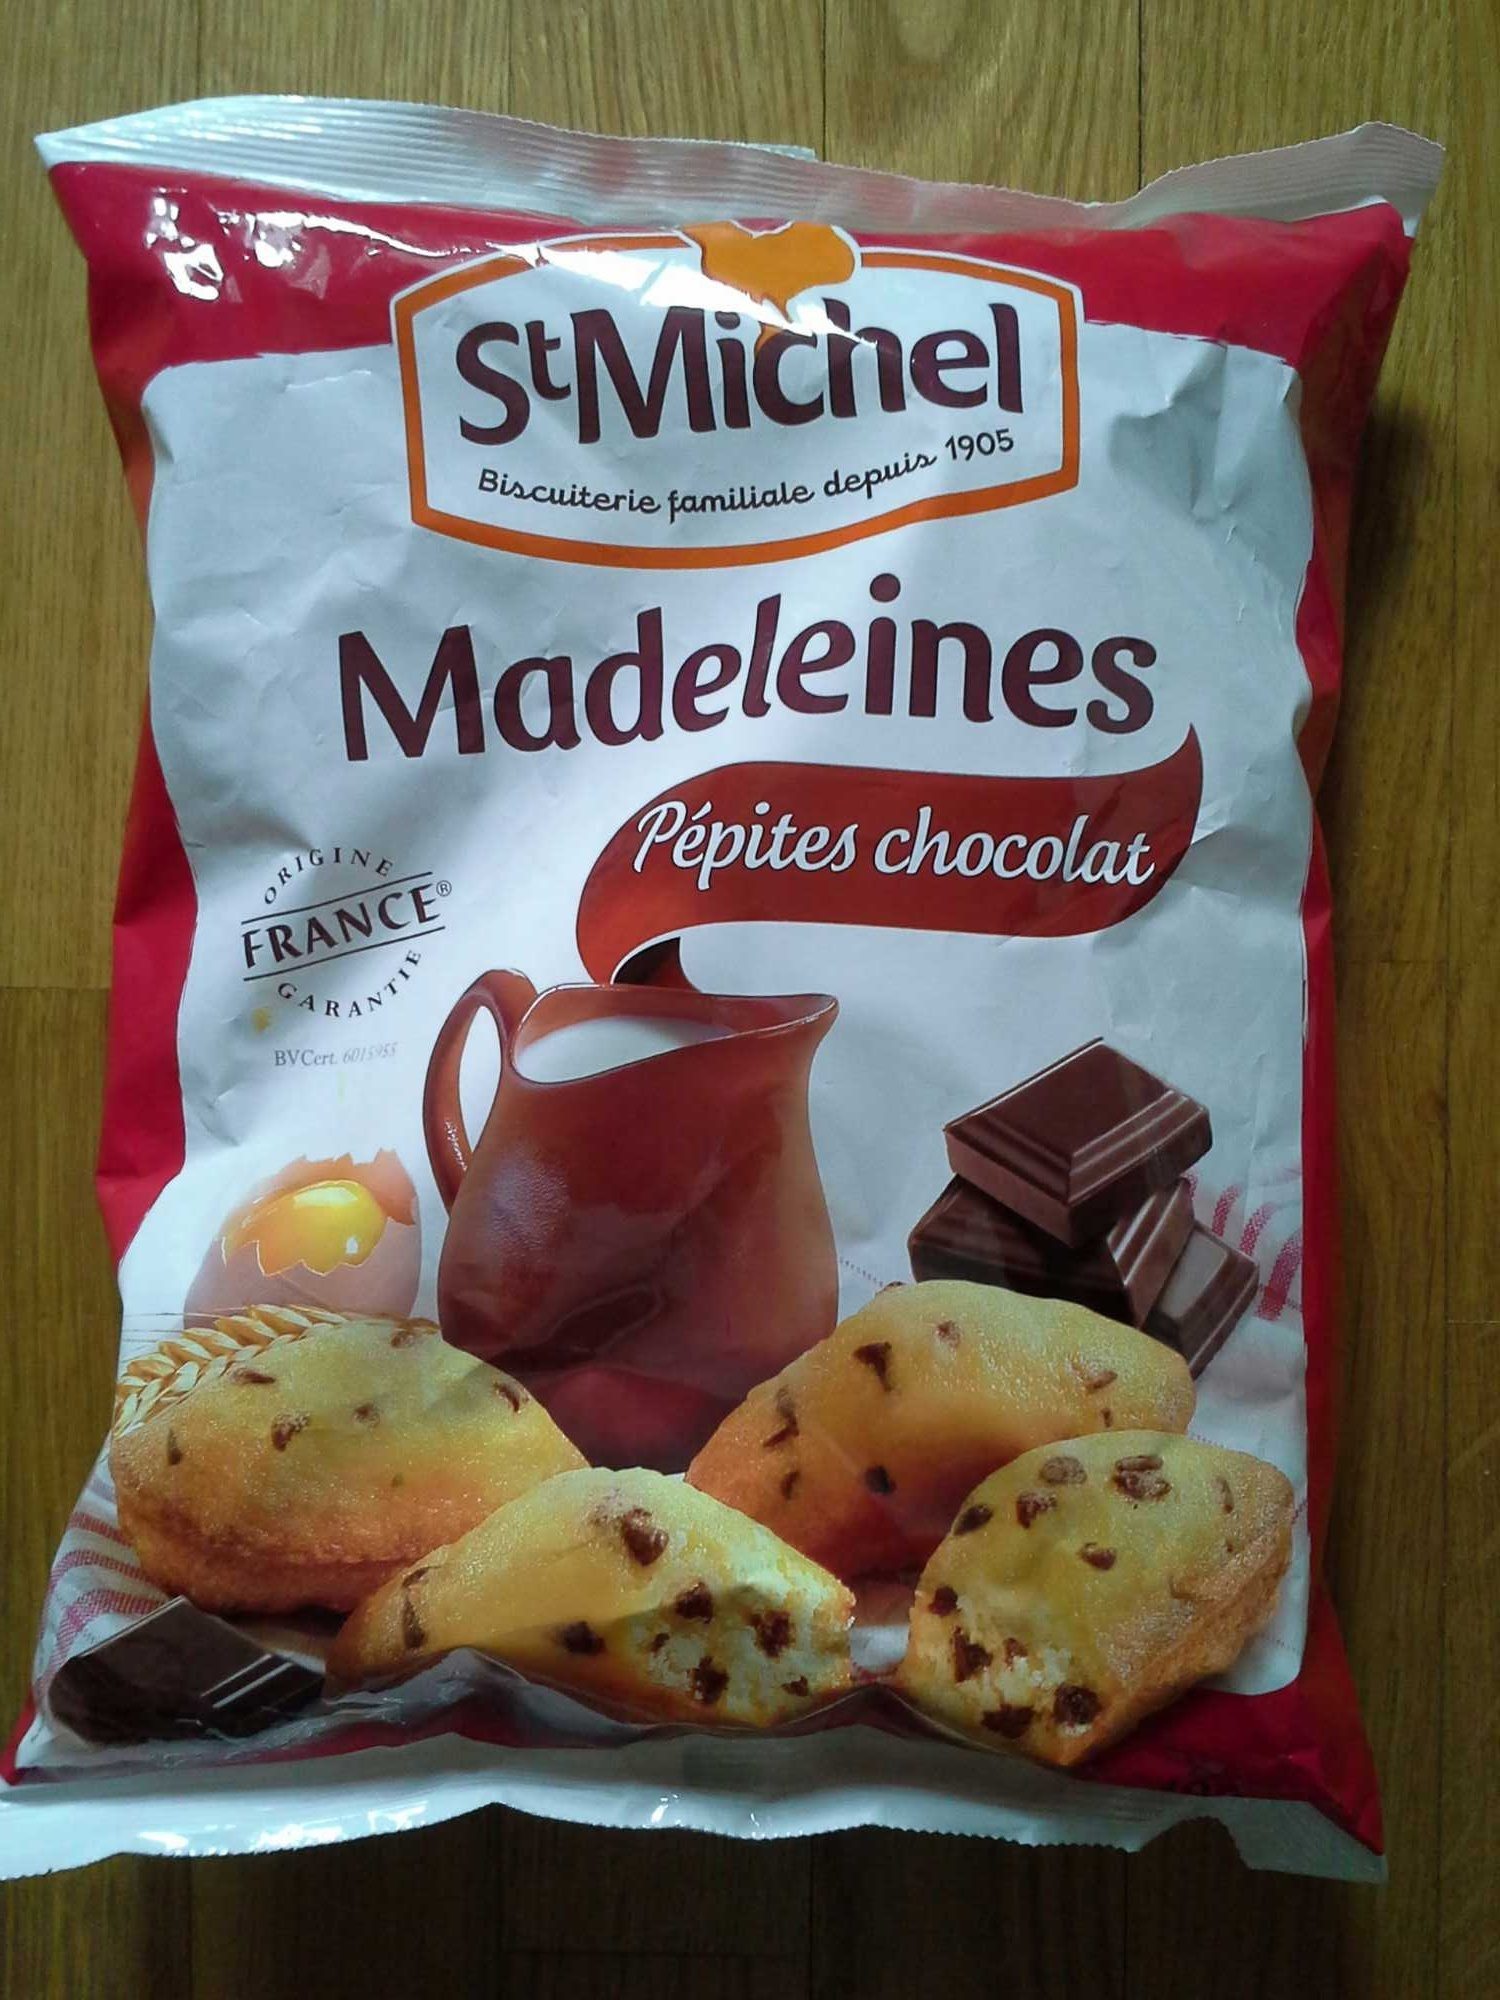 Madeleines pépites chocolat - Produit - fr